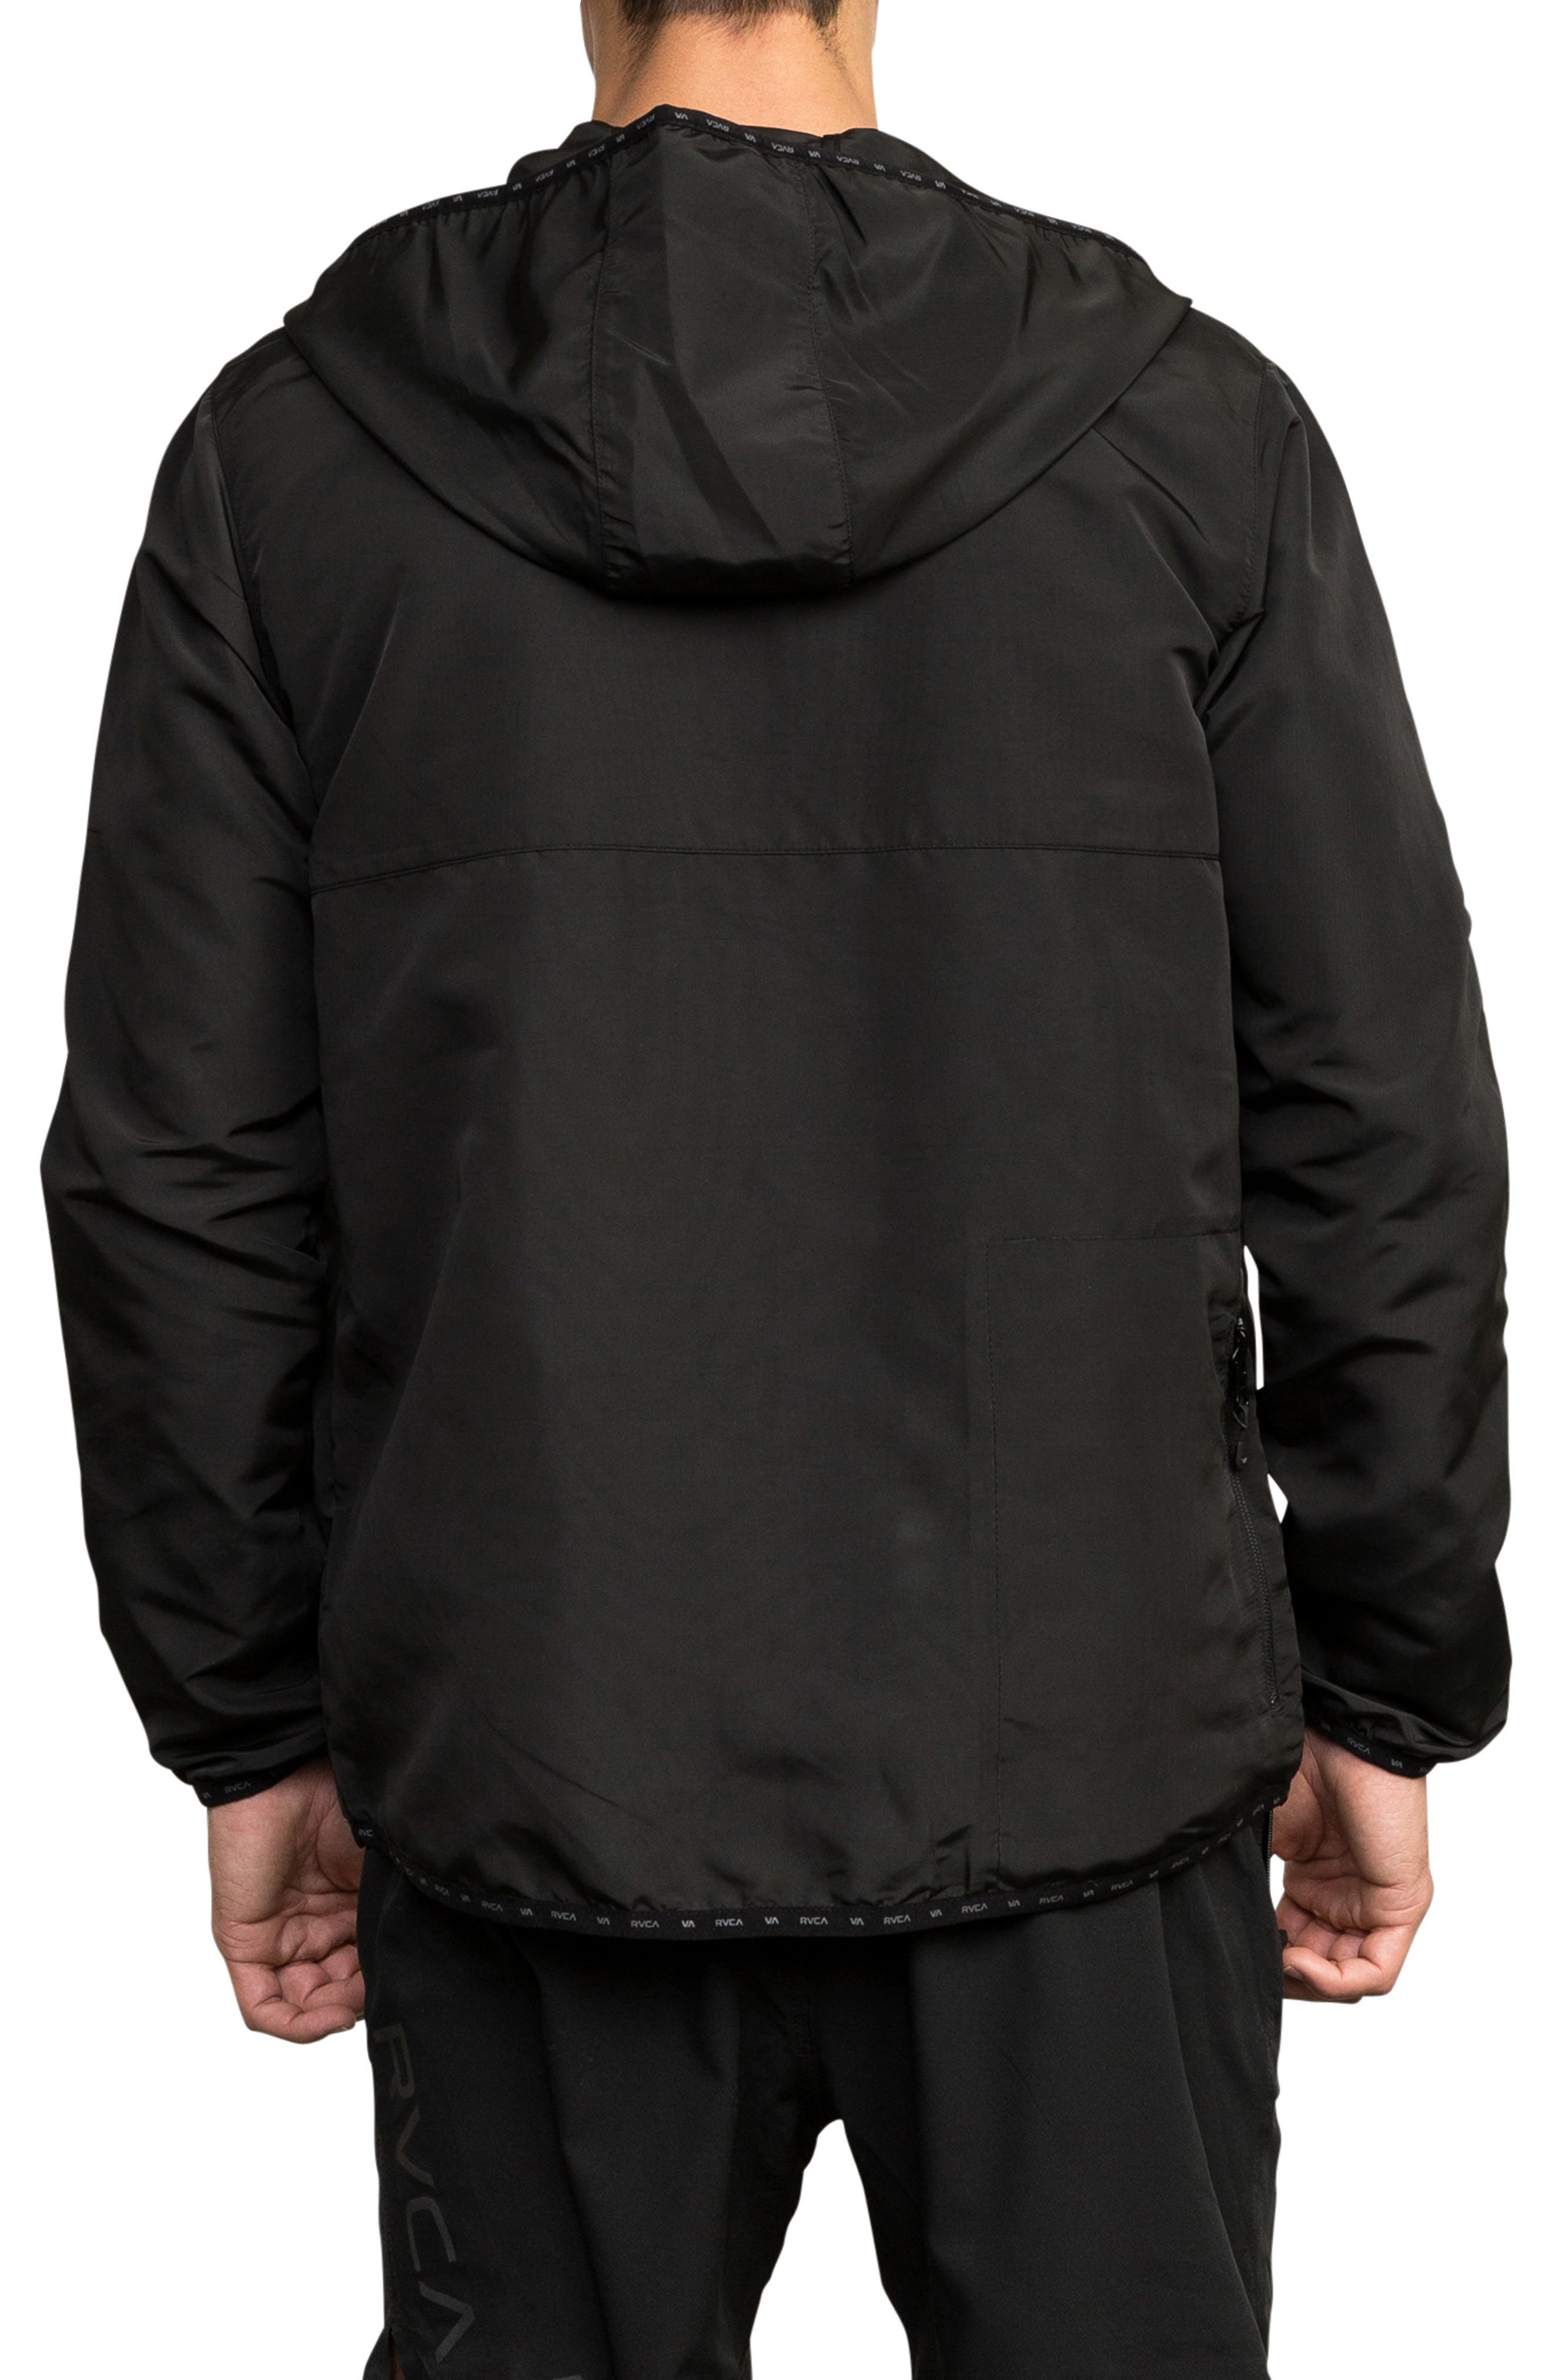 Axe Packable Water Resistant Jacket,                             Alternate thumbnail 2, color,                             BLACK